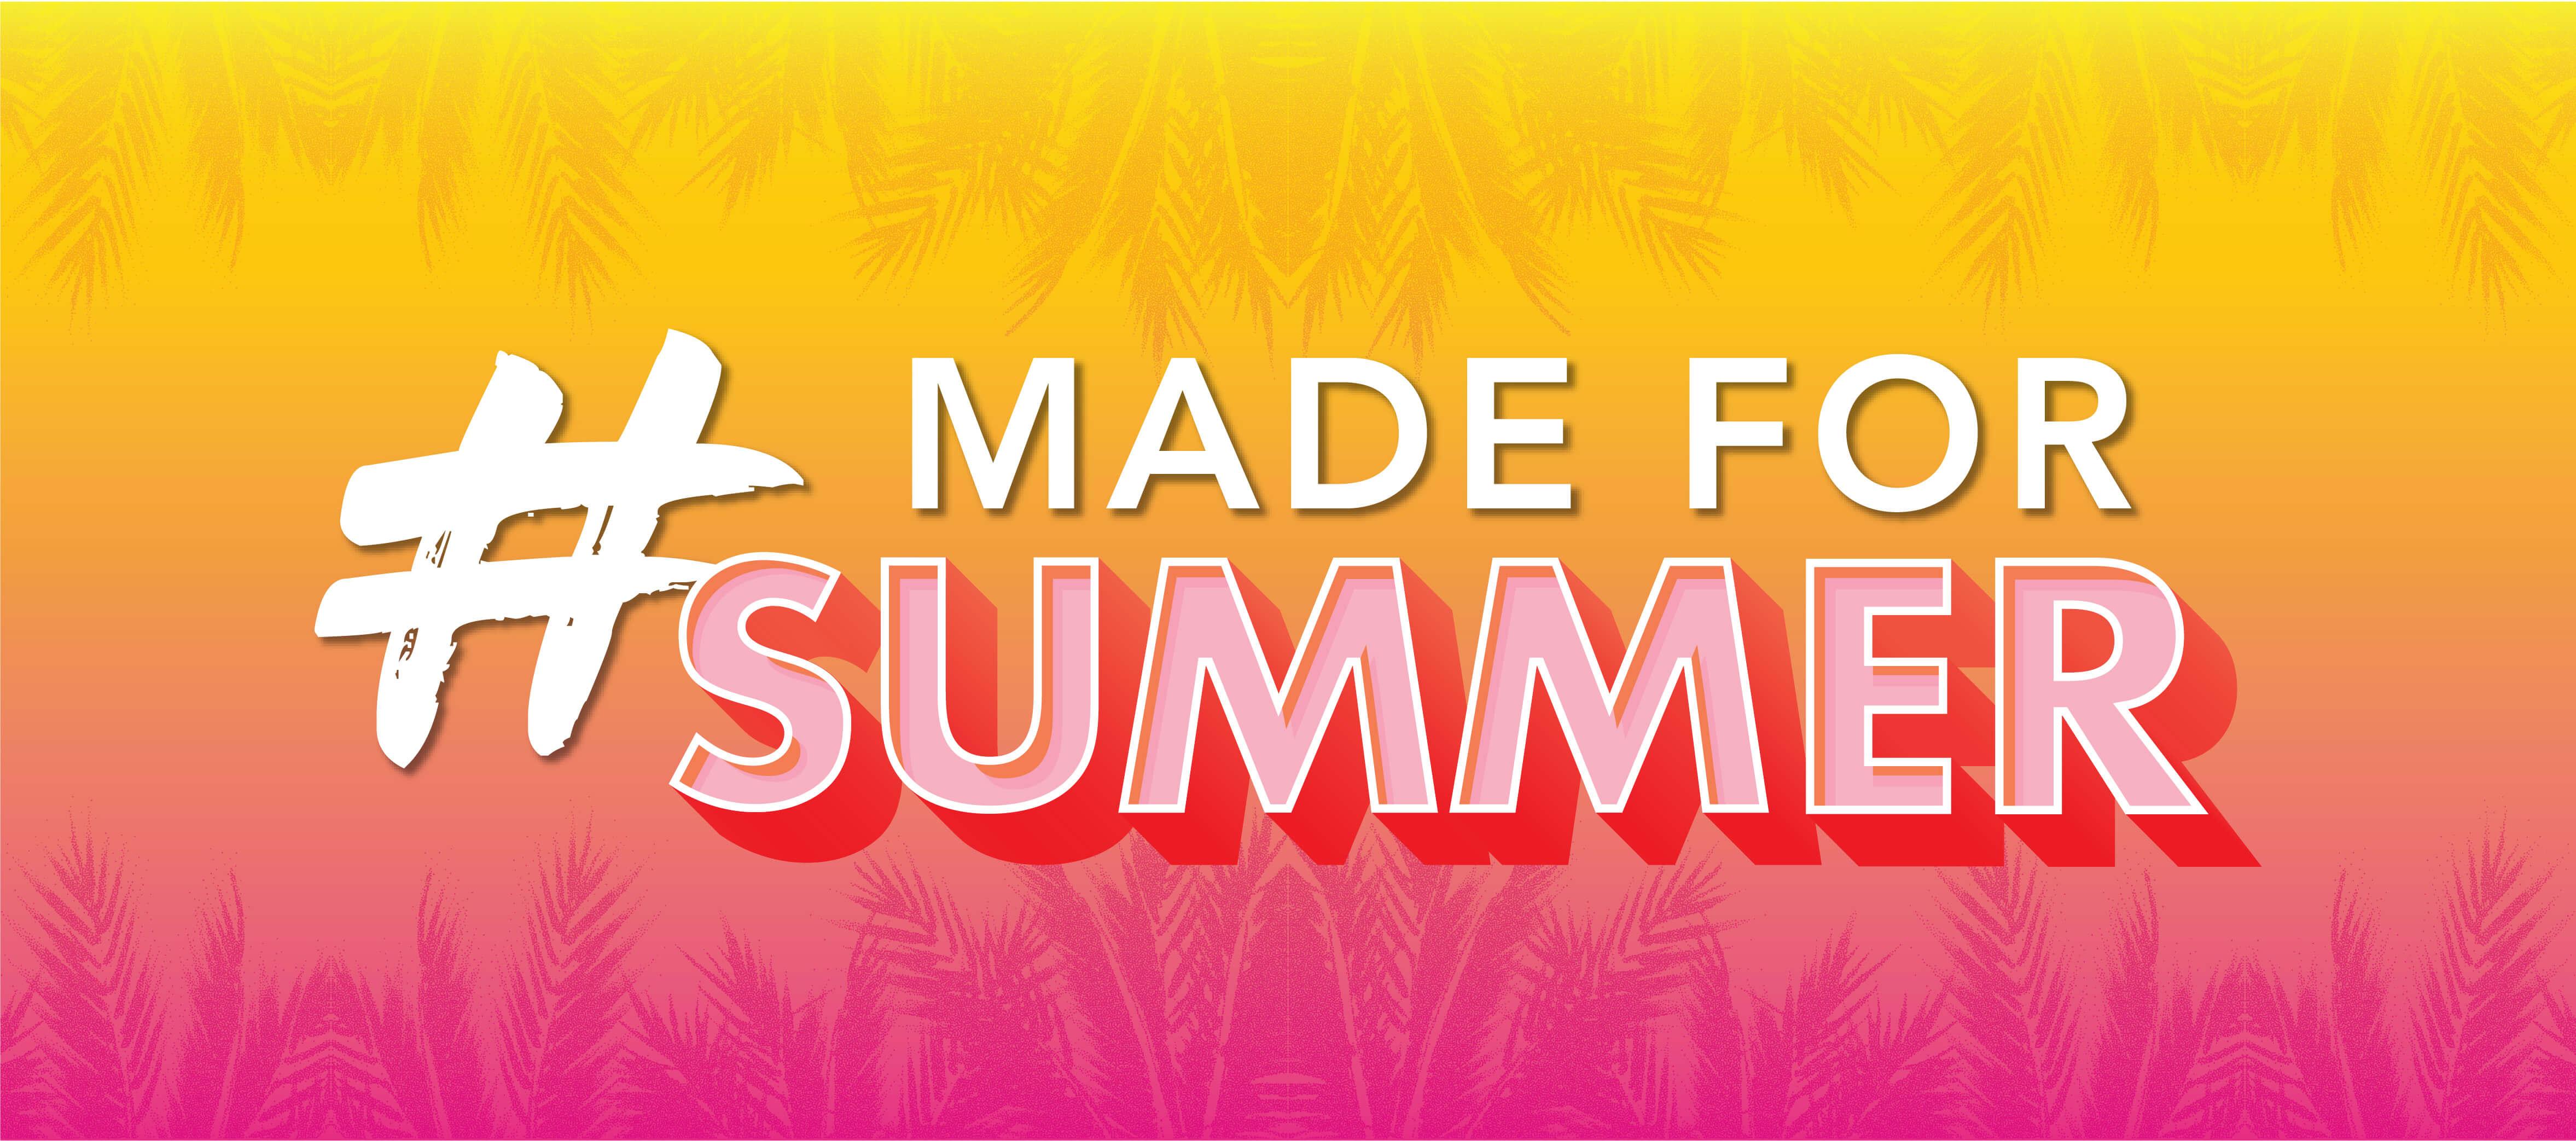 Made-for-summer-header